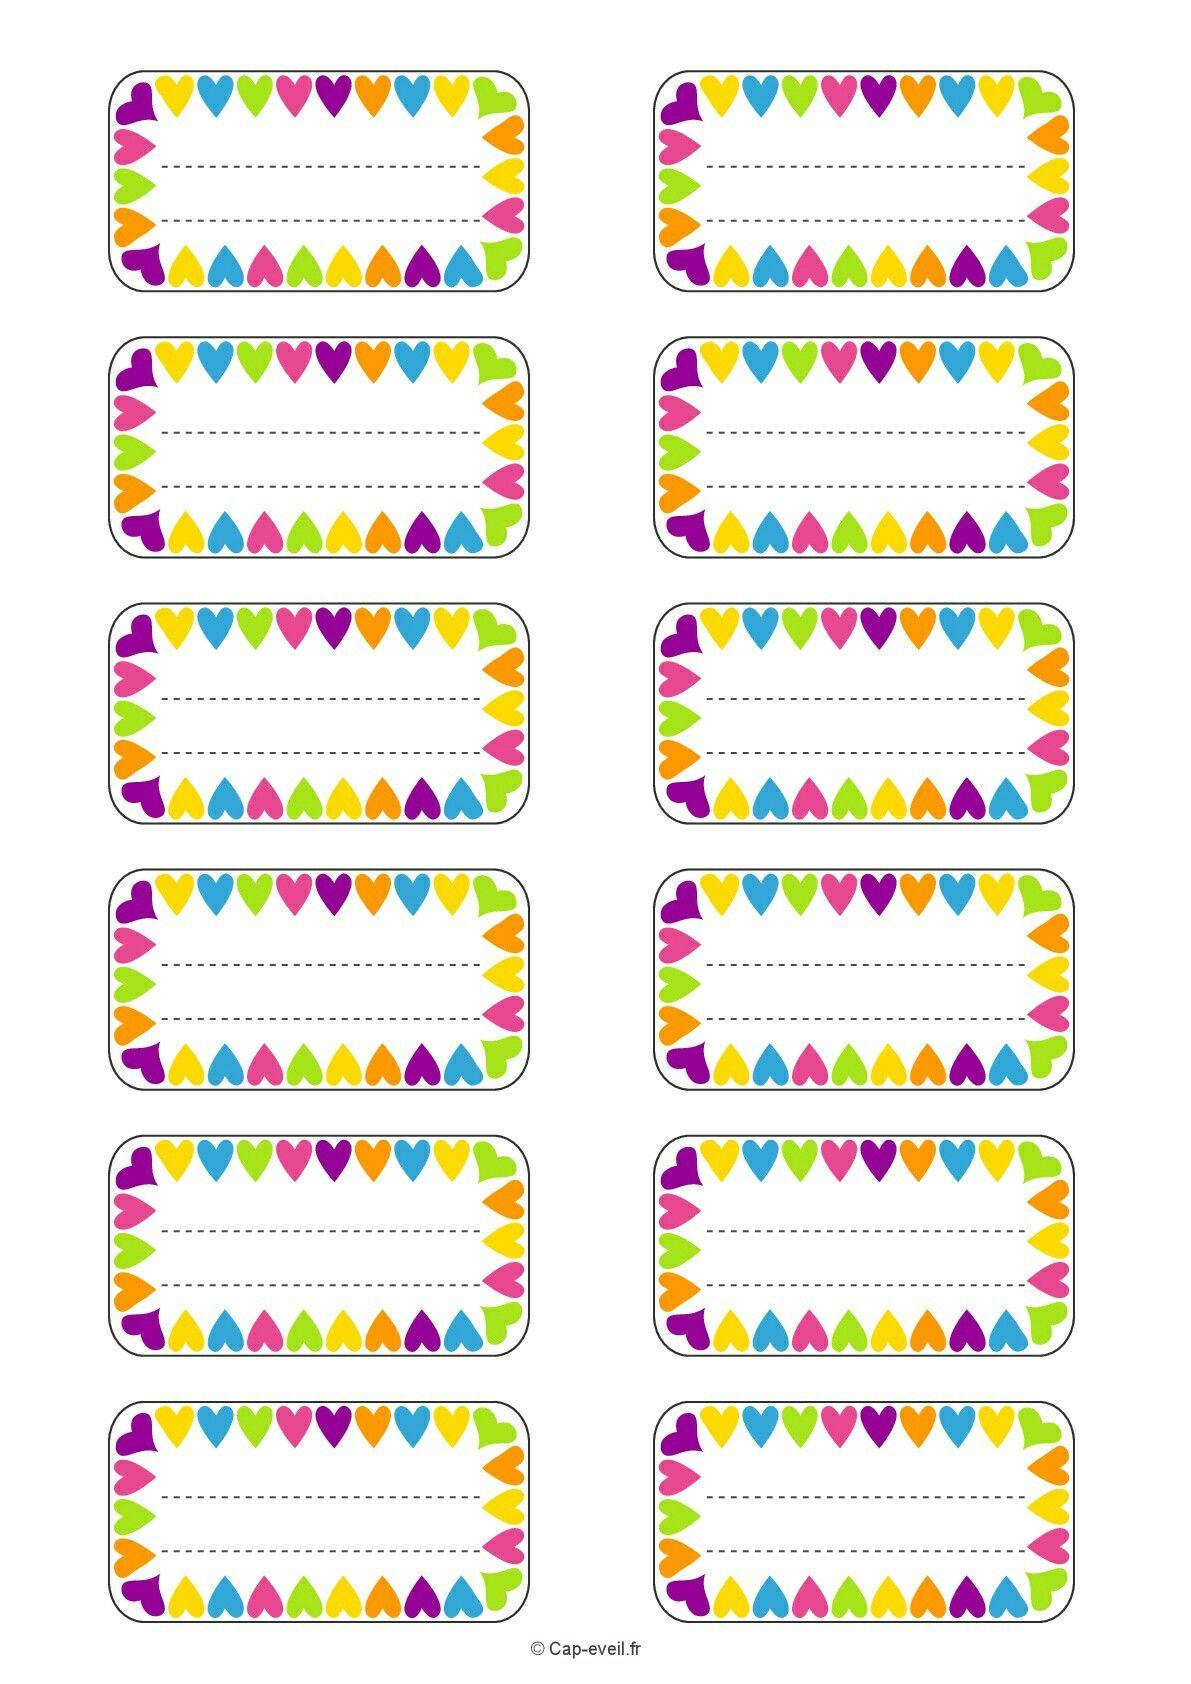 Etiquetas Escolares | Free Printable | Pinterest | School Labels - Free Printable Name Tags For Preschoolers